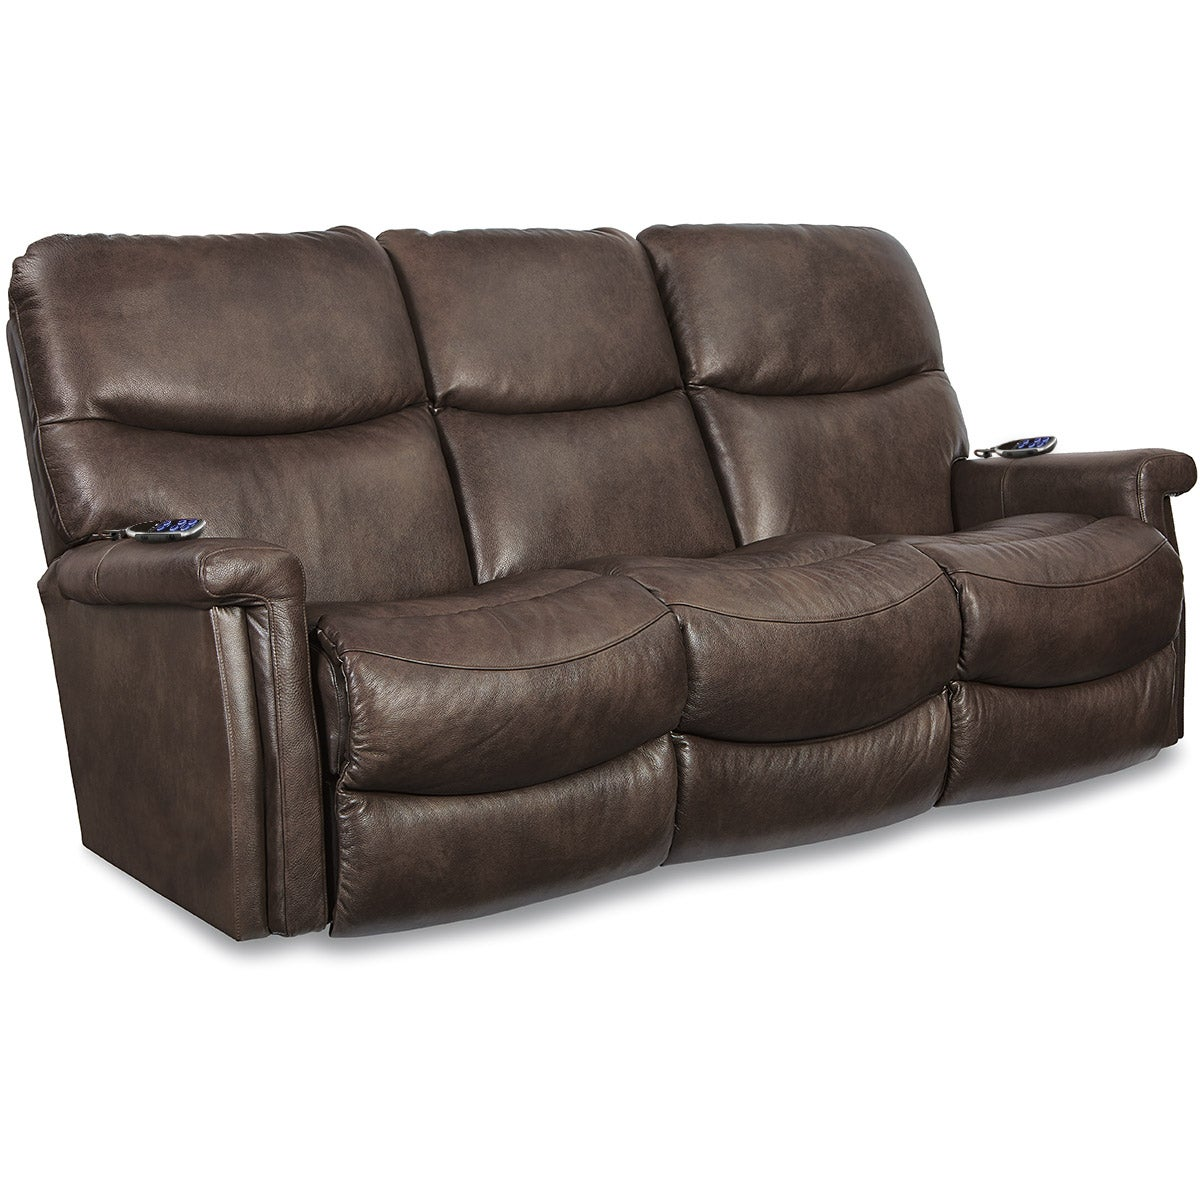 Baylor PowerReclineXRw ™ Full Reclining Sofa